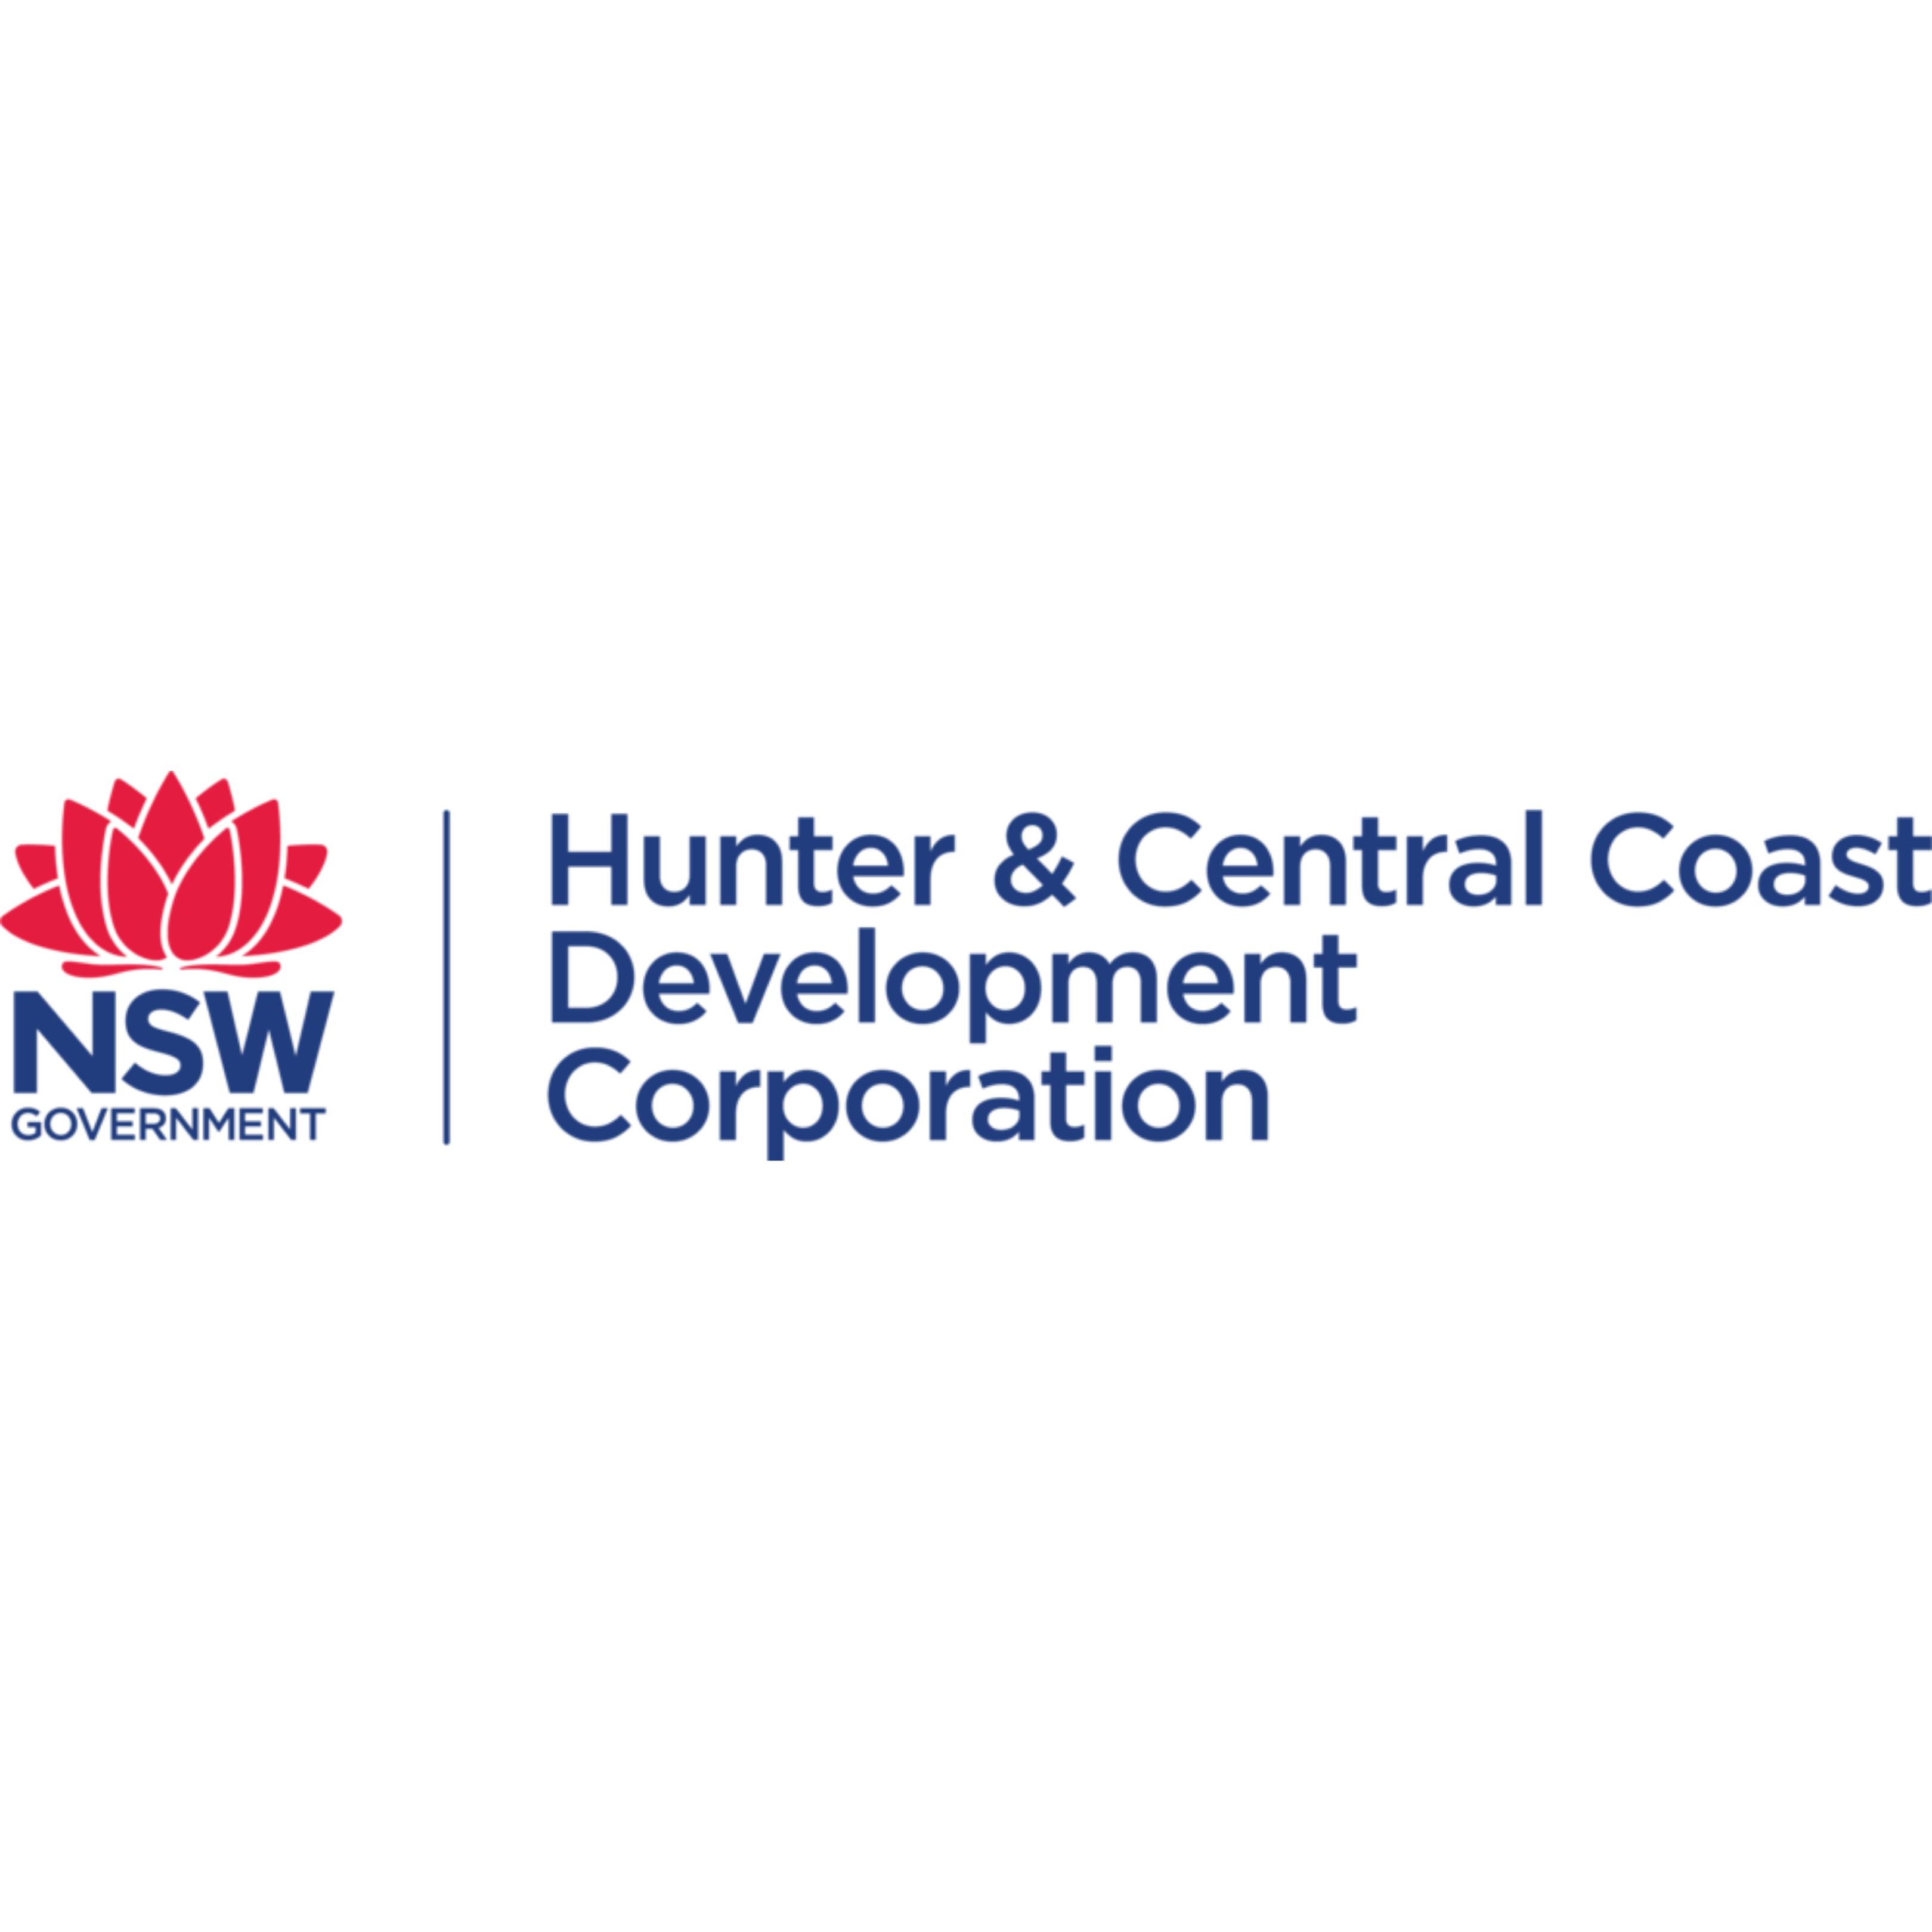 Hunter & Central Coast Development Corporation